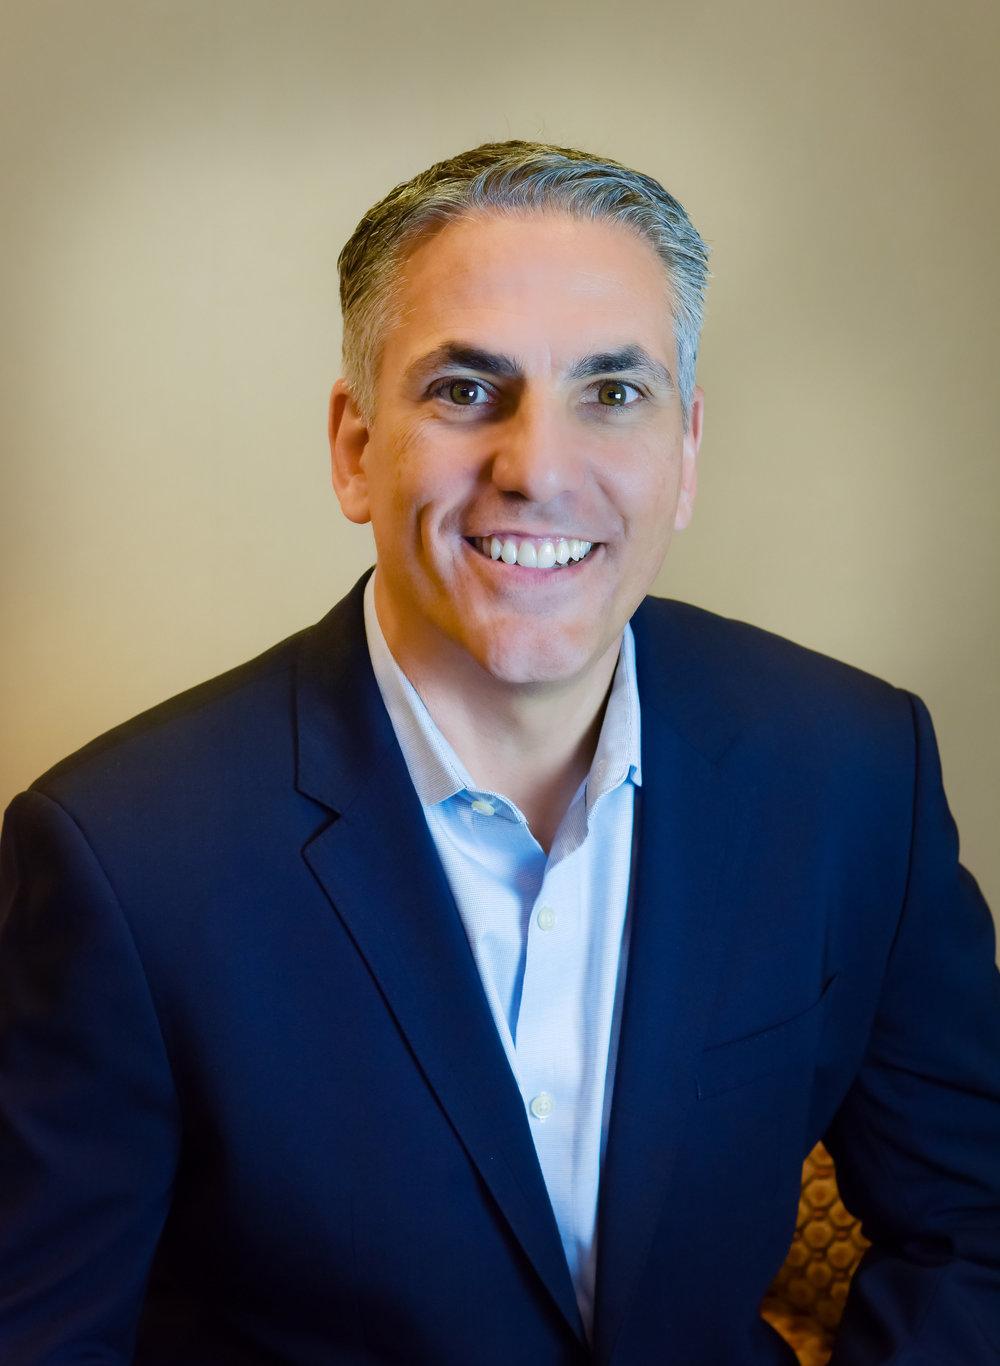 David Rosenblatt Trustee